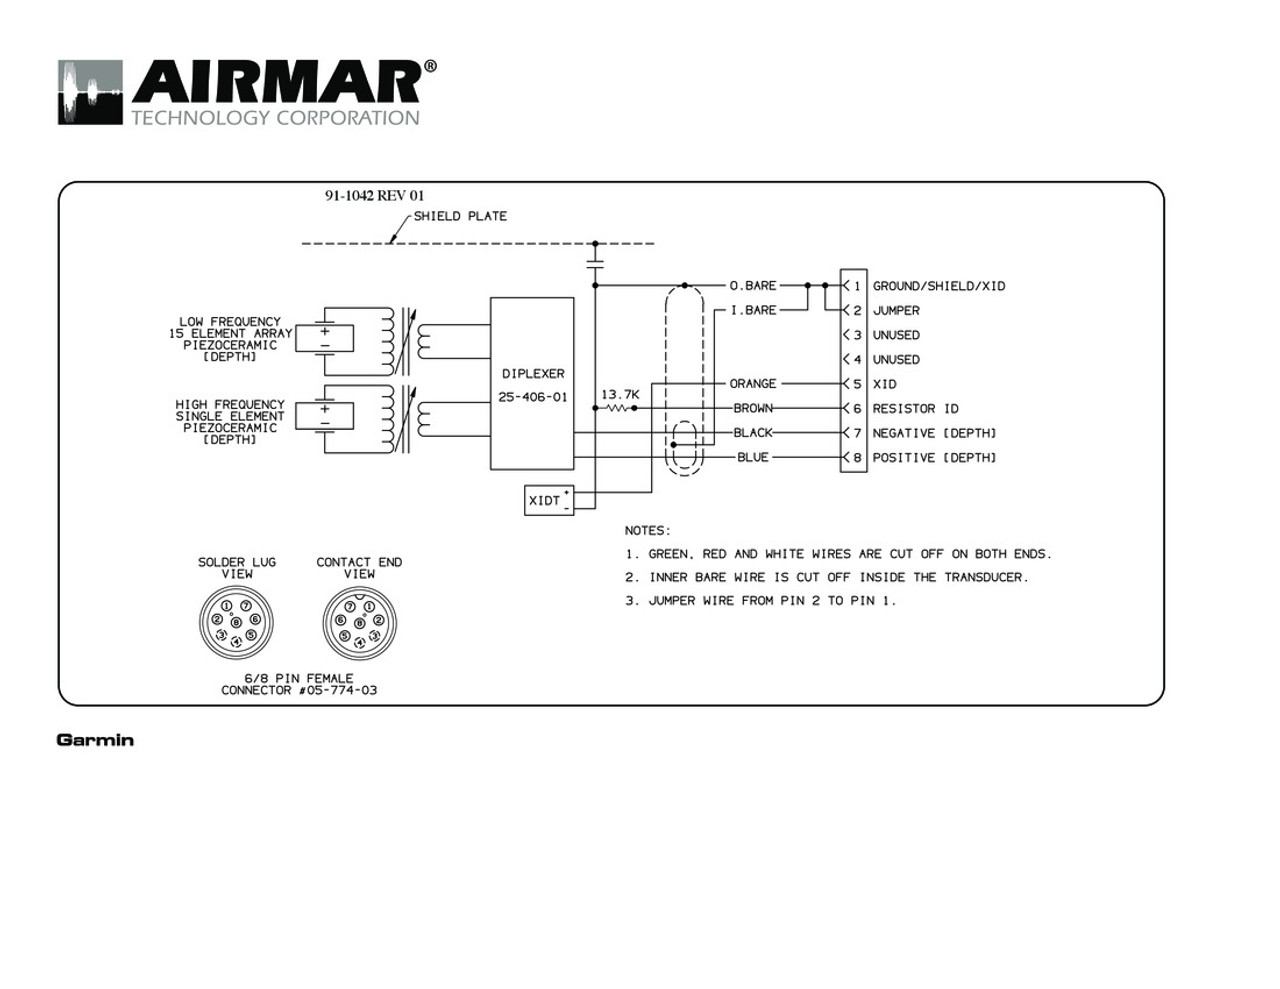 Garmin 5212 Chartplotter Marine Wiring Diagram | Wiring Liry on